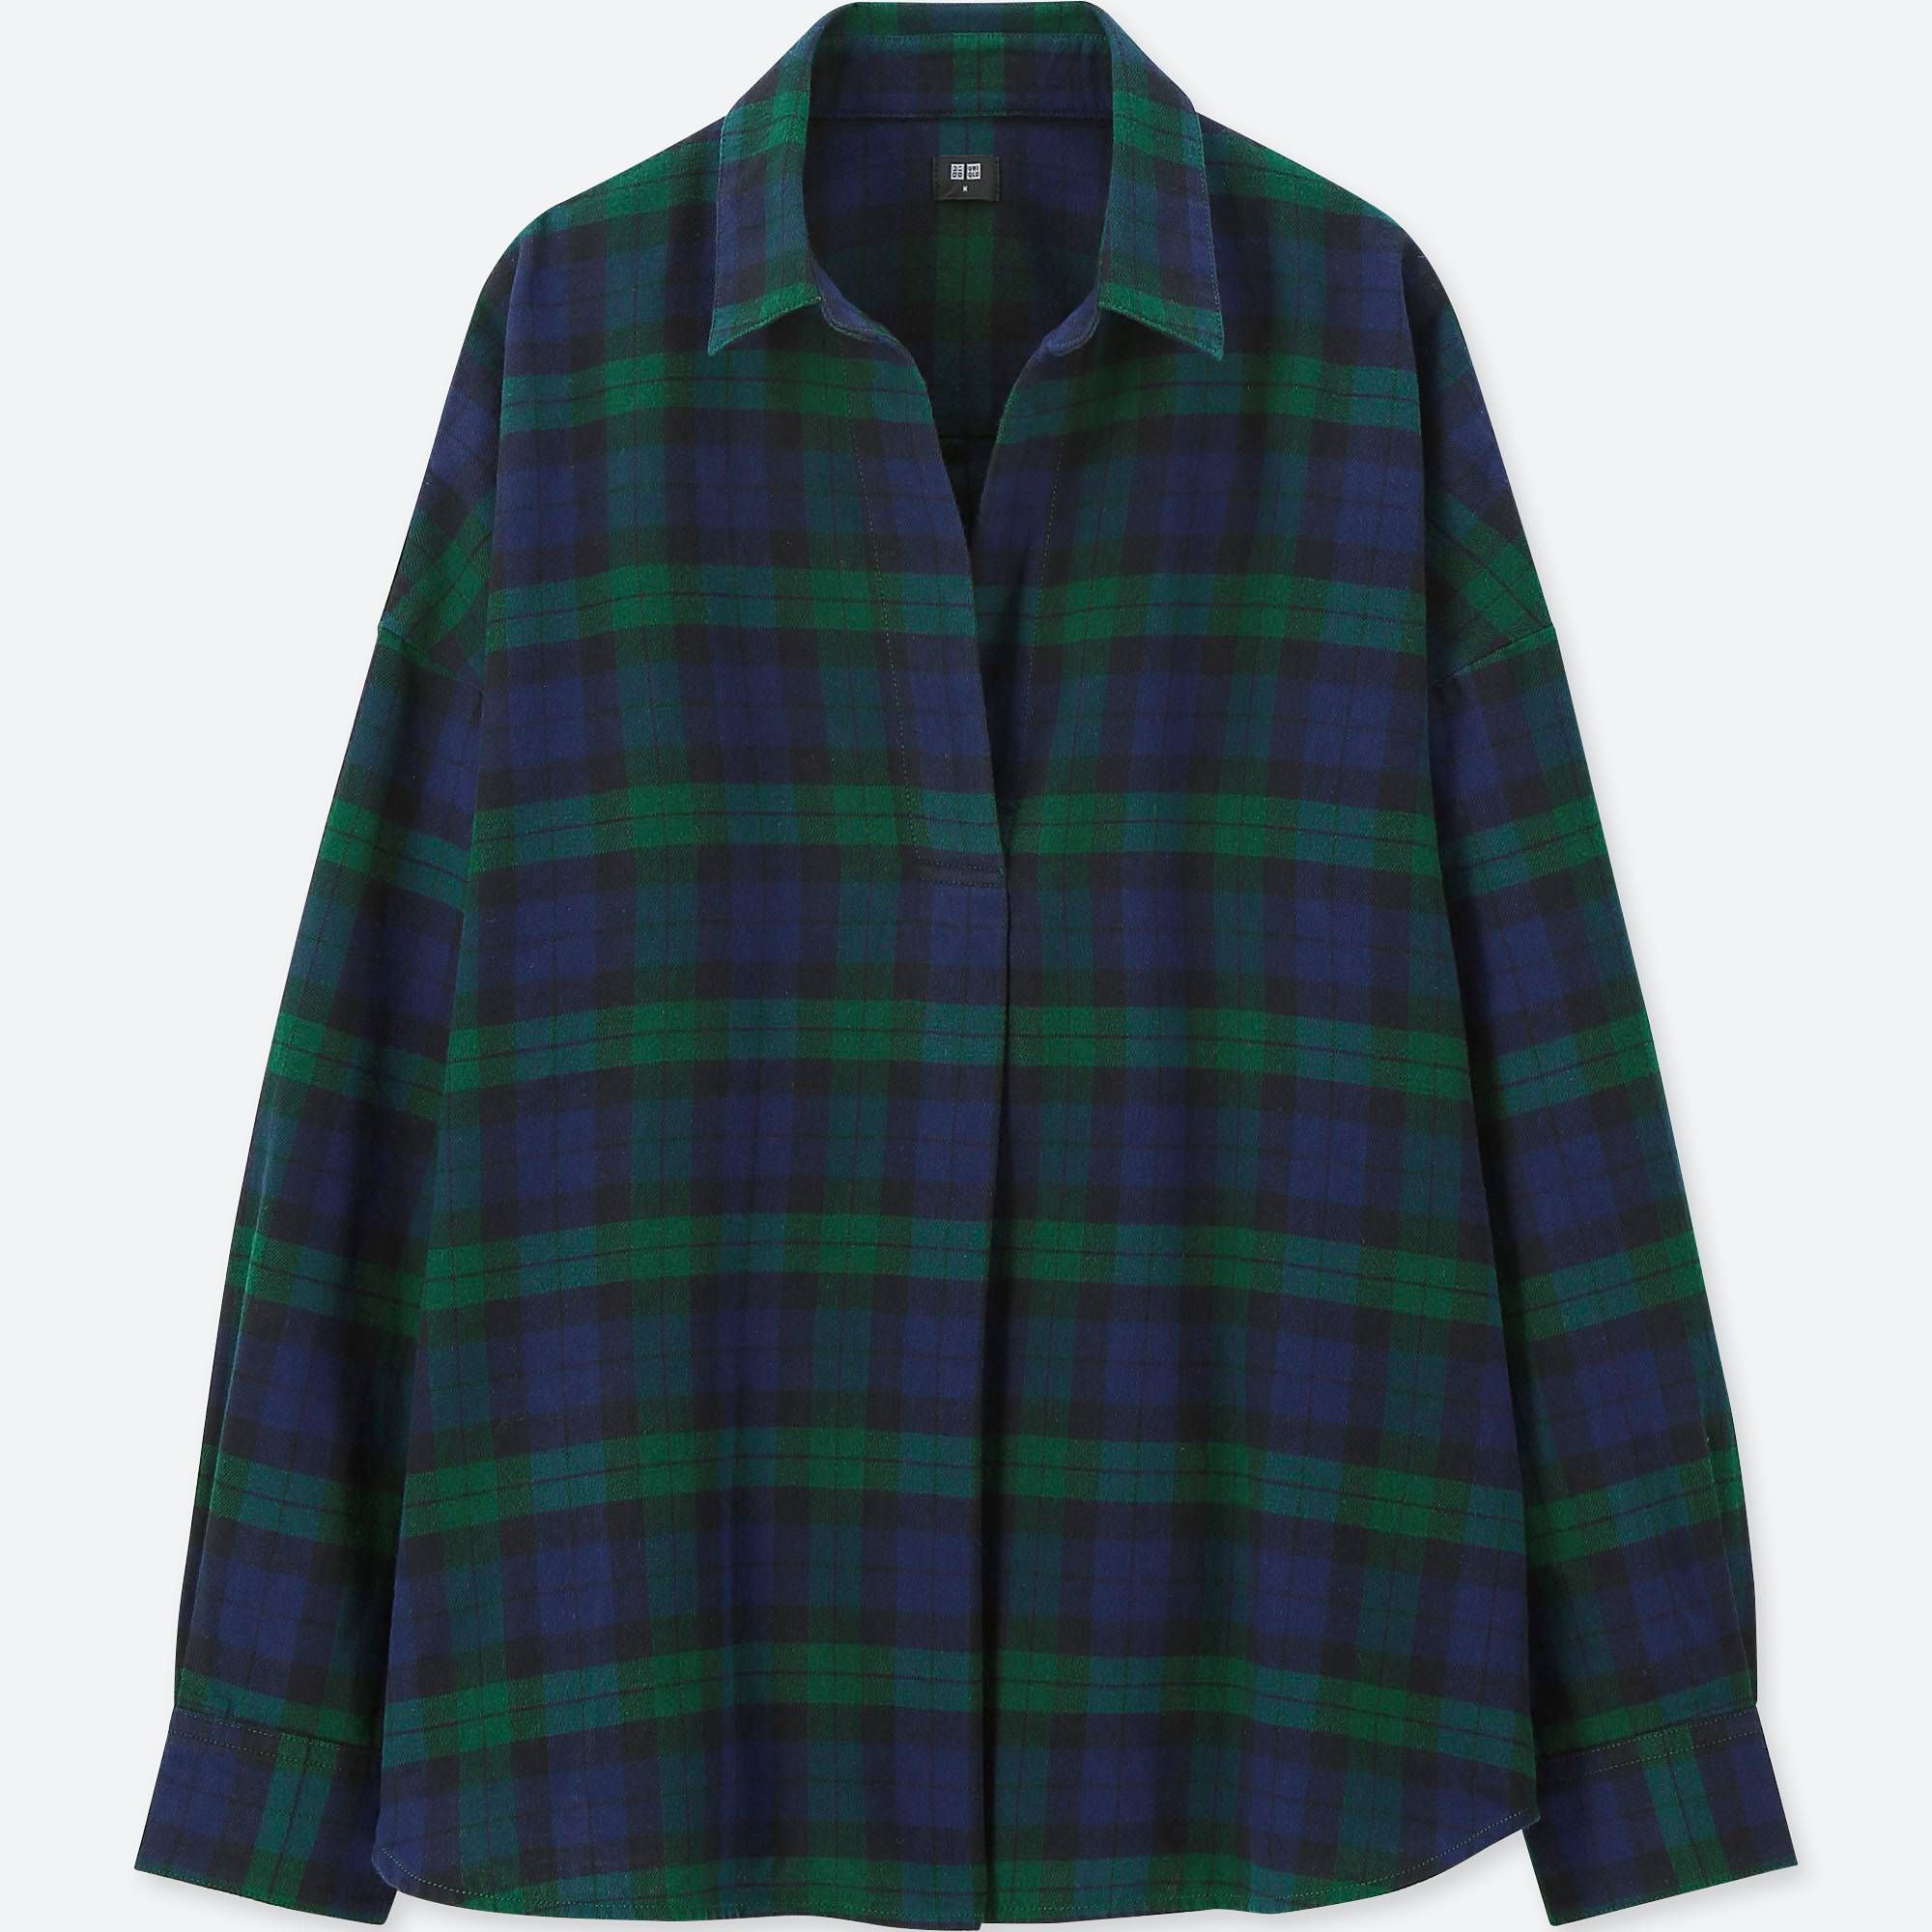 8ed80ccb Women Flannel Checked Skipper Long-Sleeved Shirt